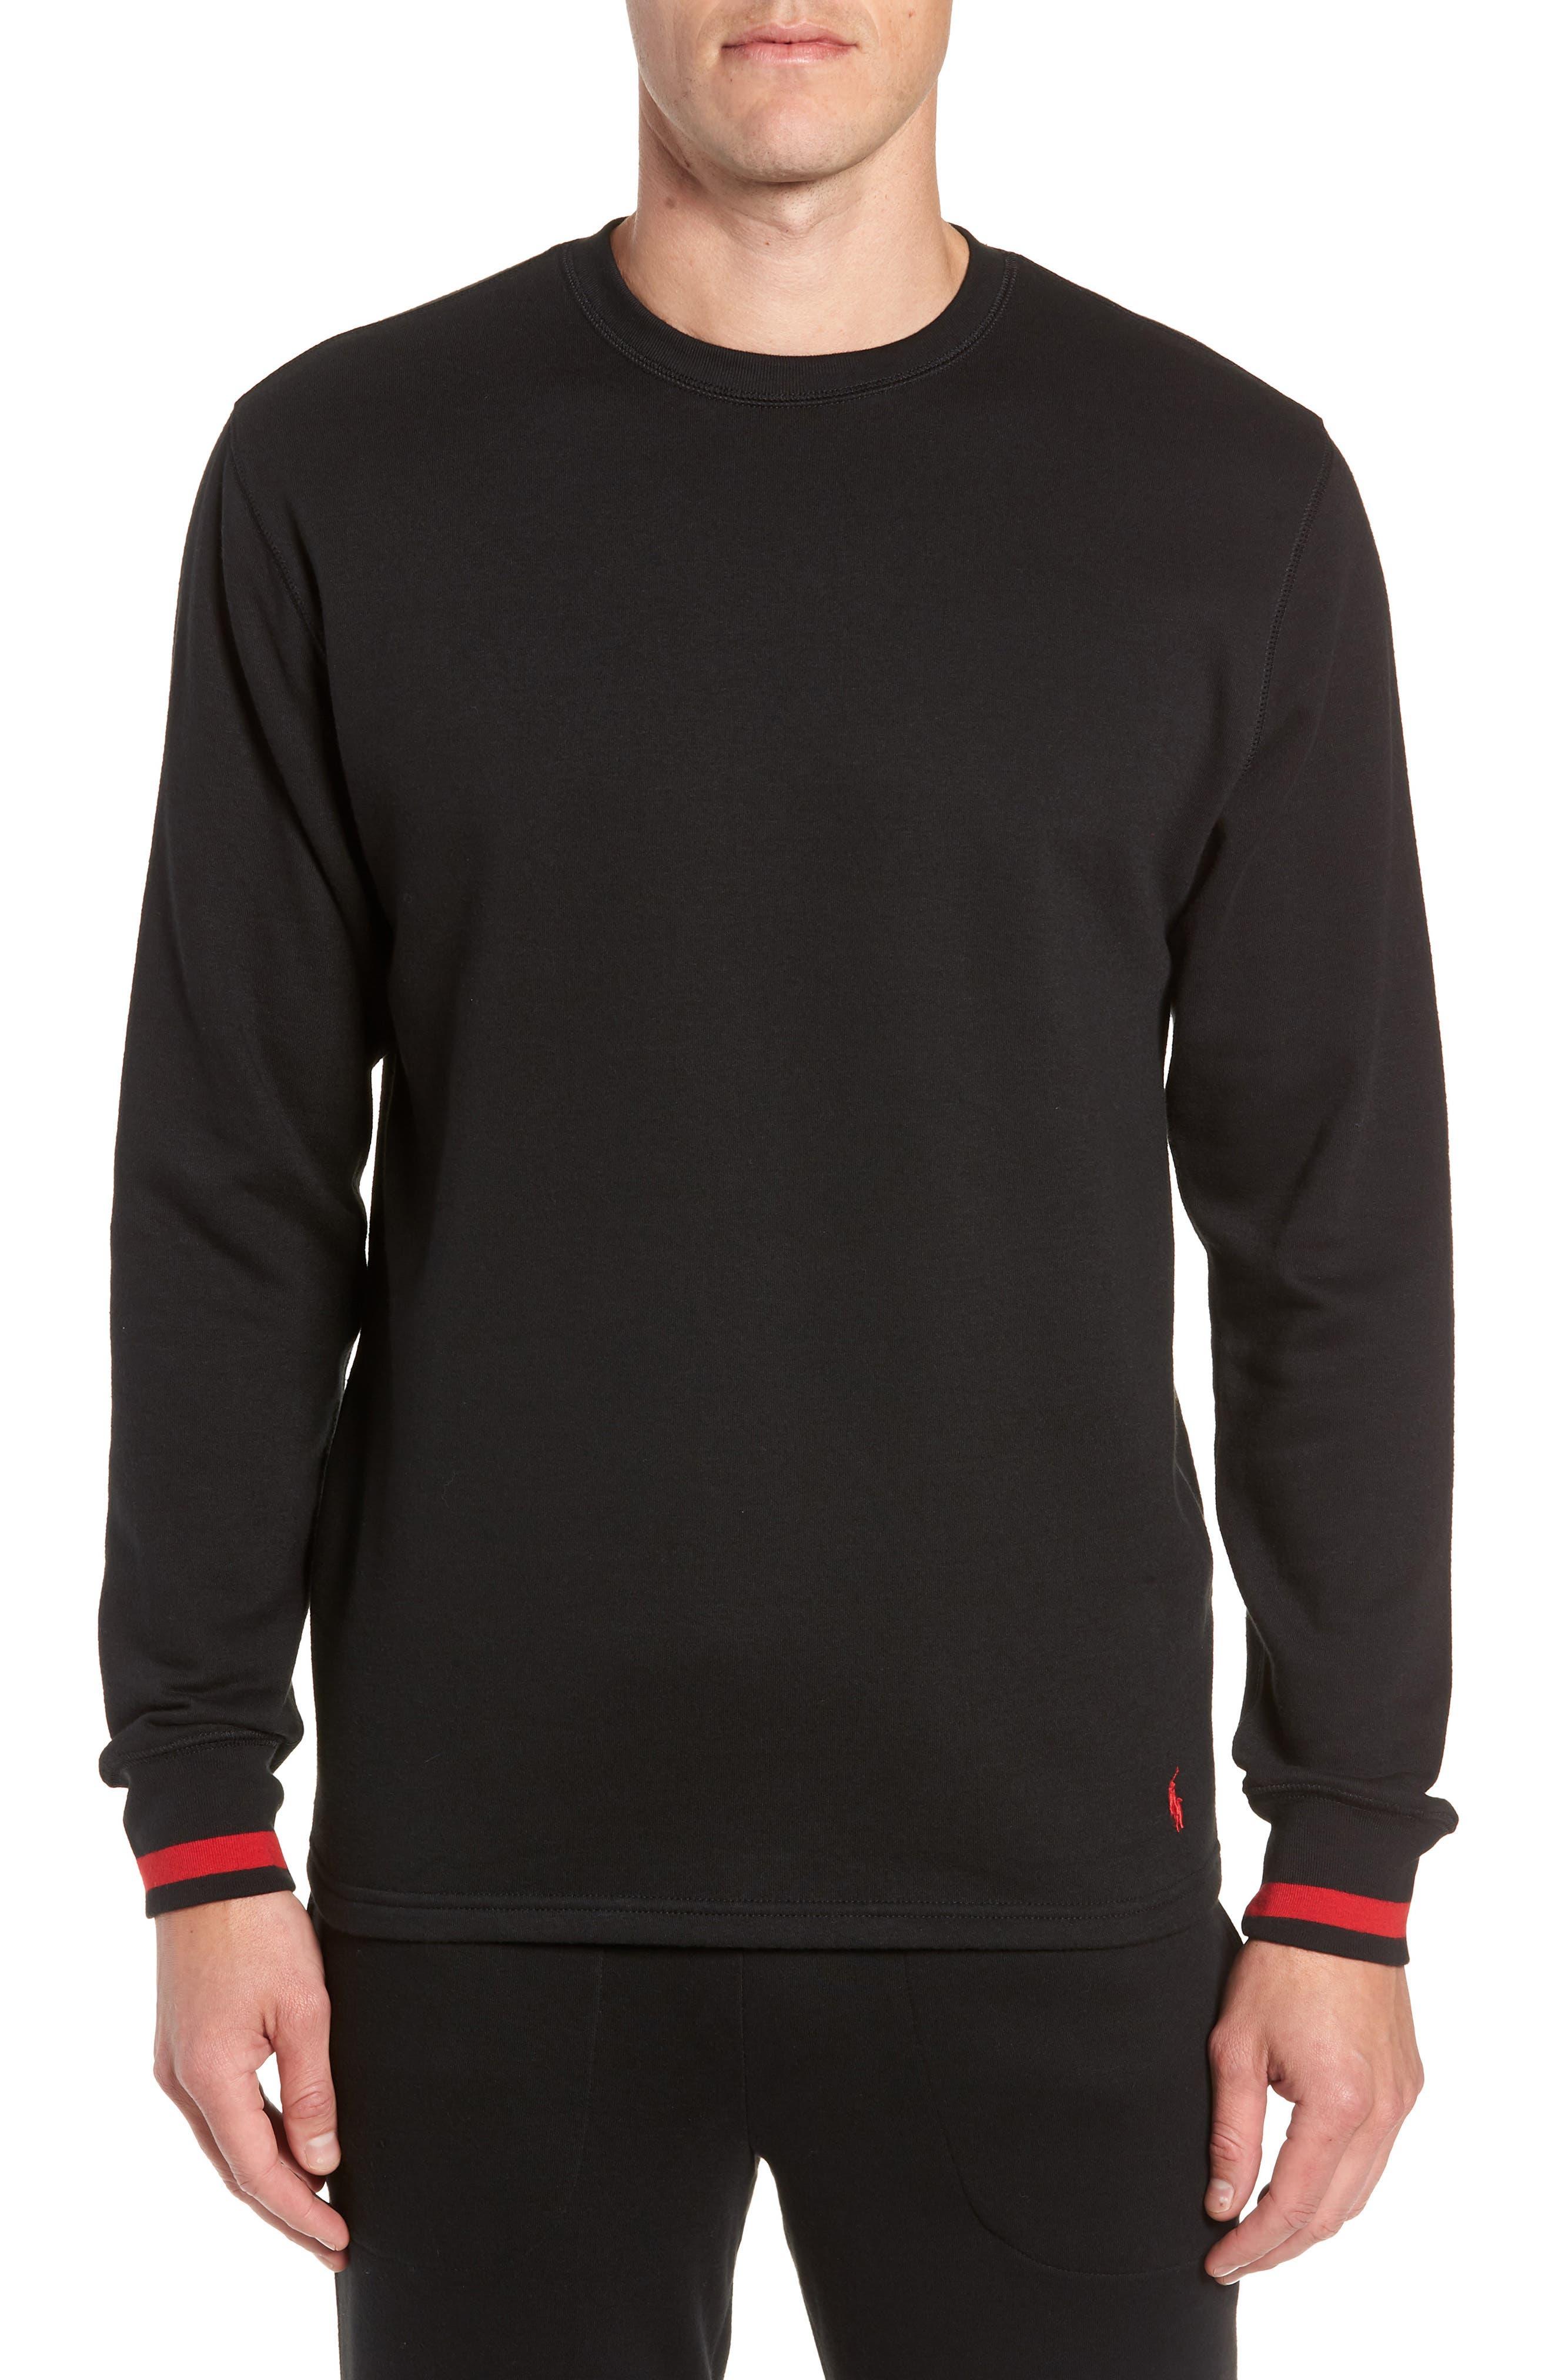 Polo Ralph Lauren Brushed Jersey Cotton Blend Crewneck Sweatshirt